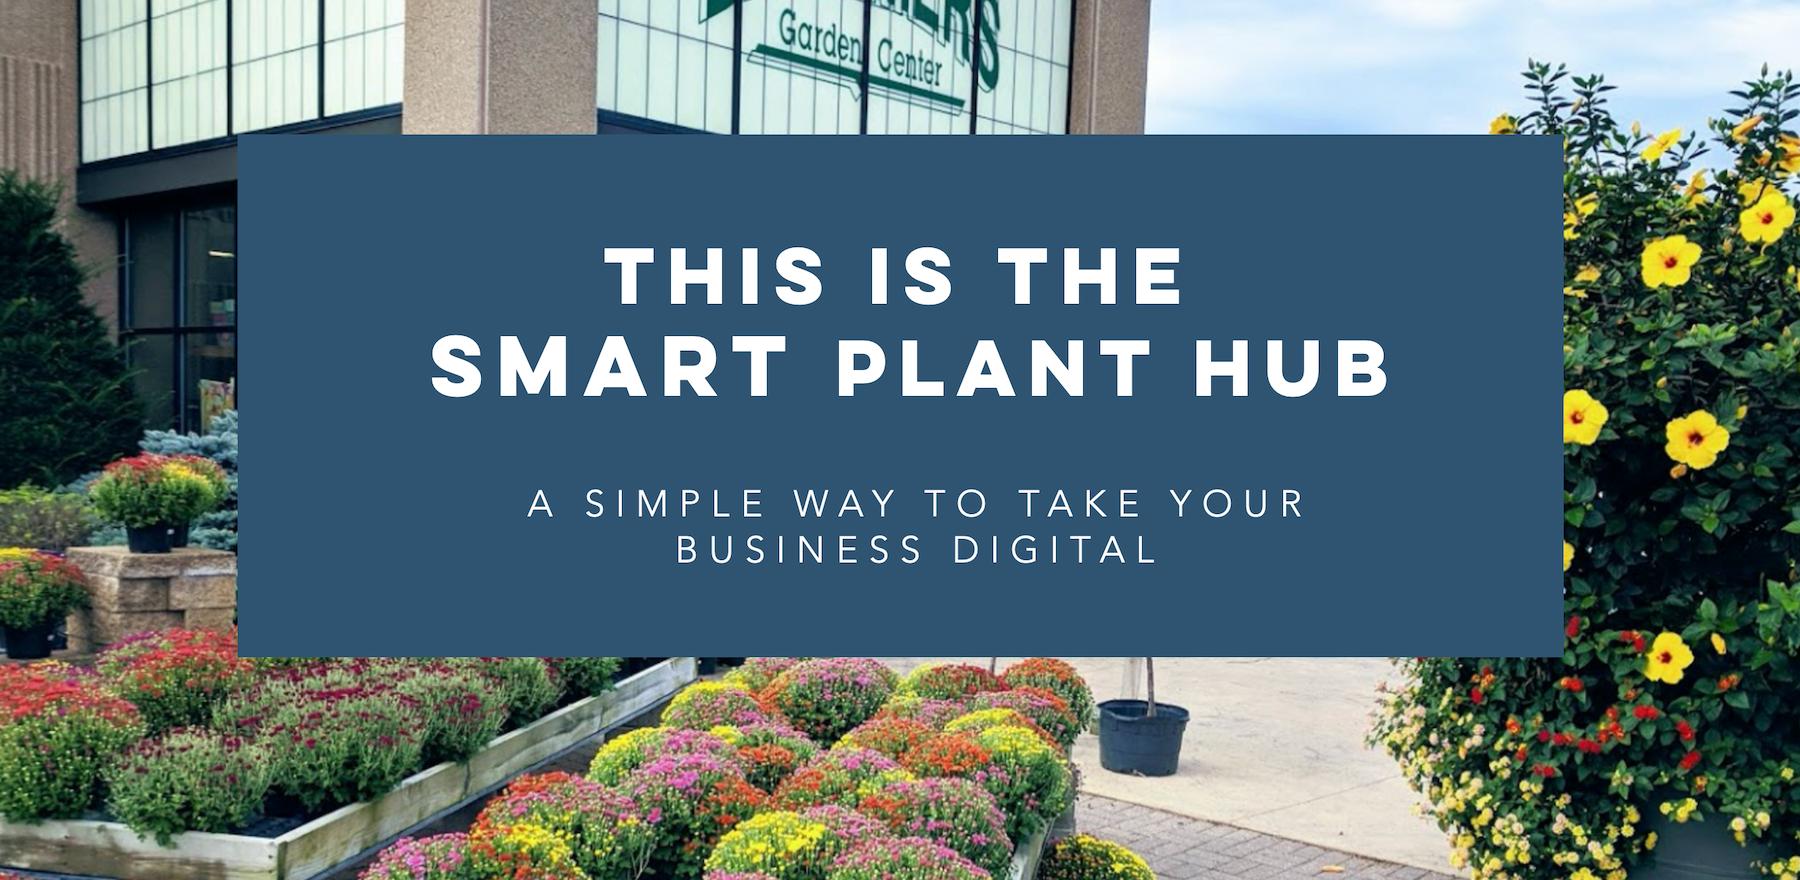 smart plant home garden centers.png